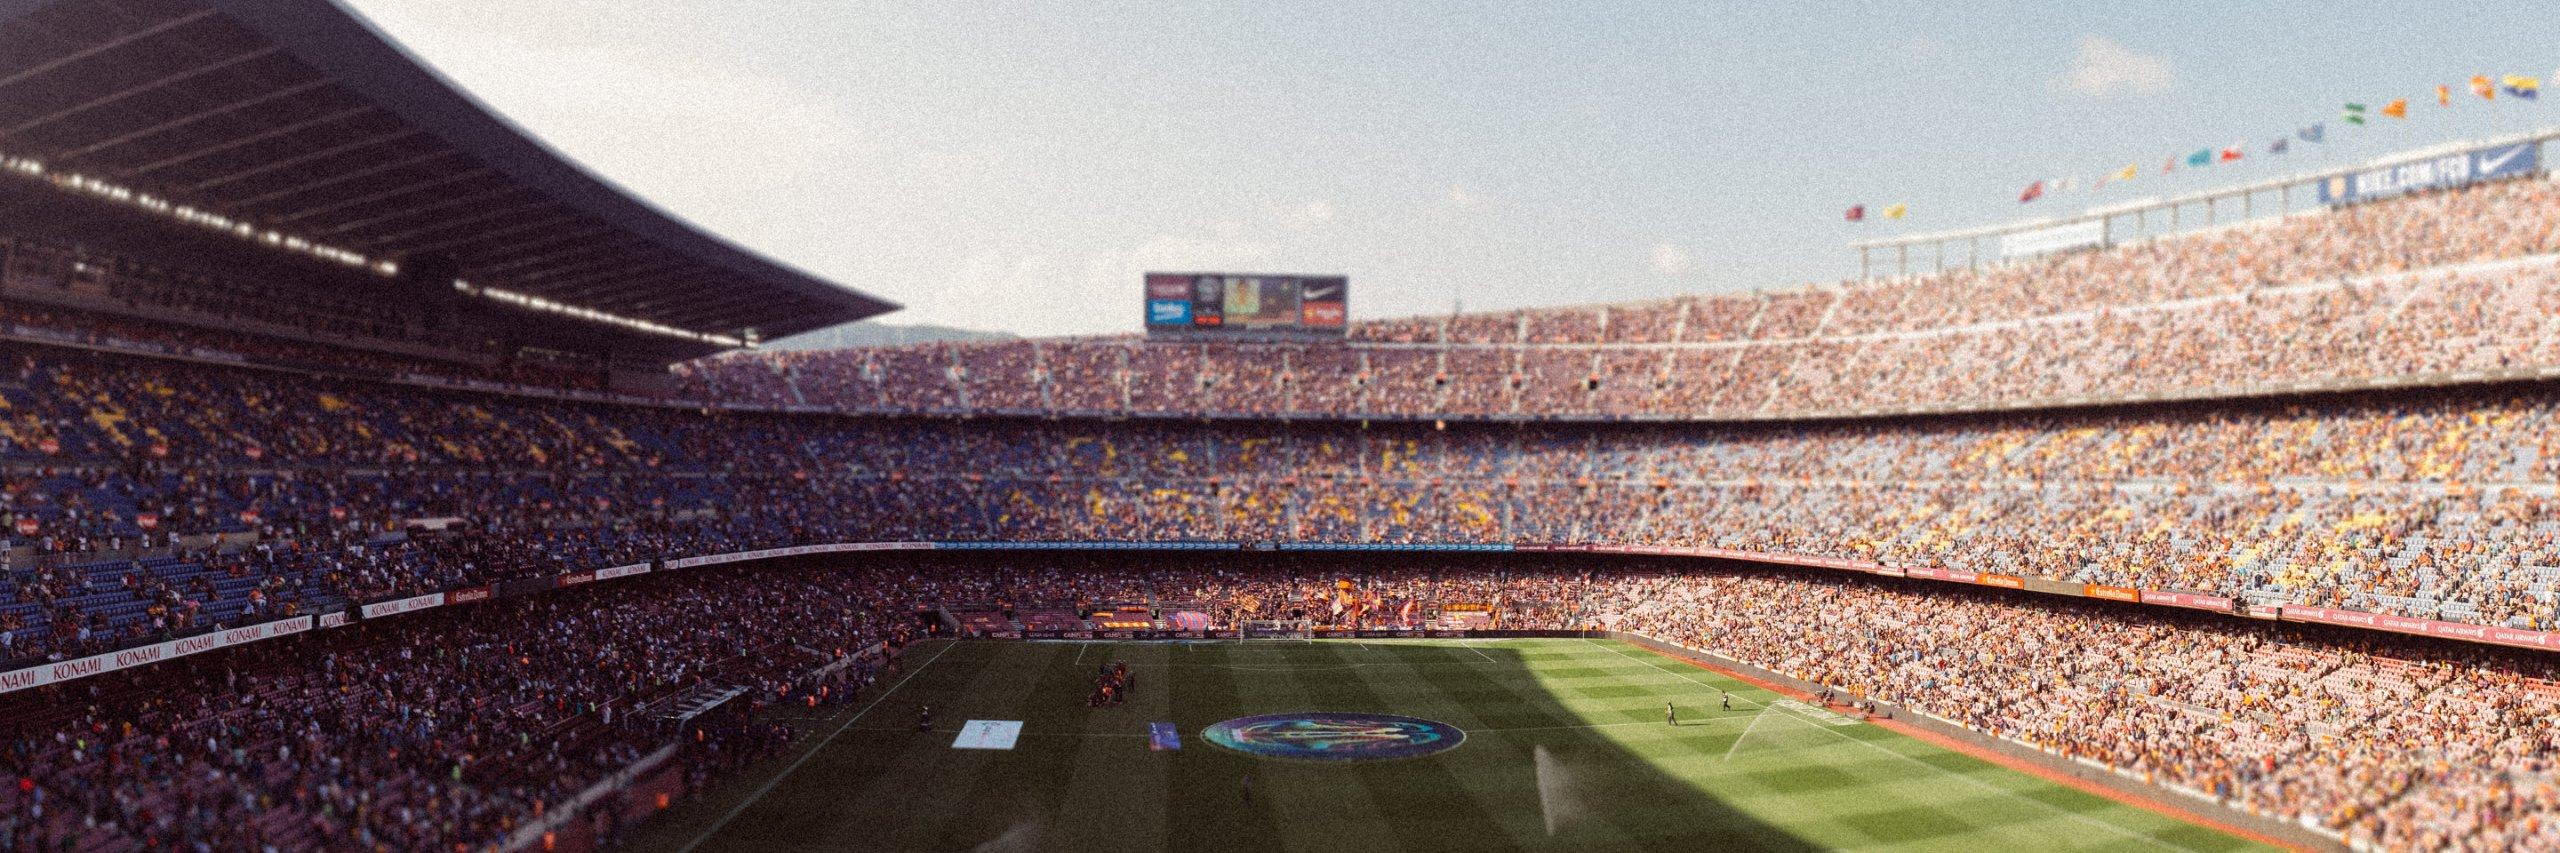 Johannes-Maur-Panorama-Fotografie-FC-Barcelona_2